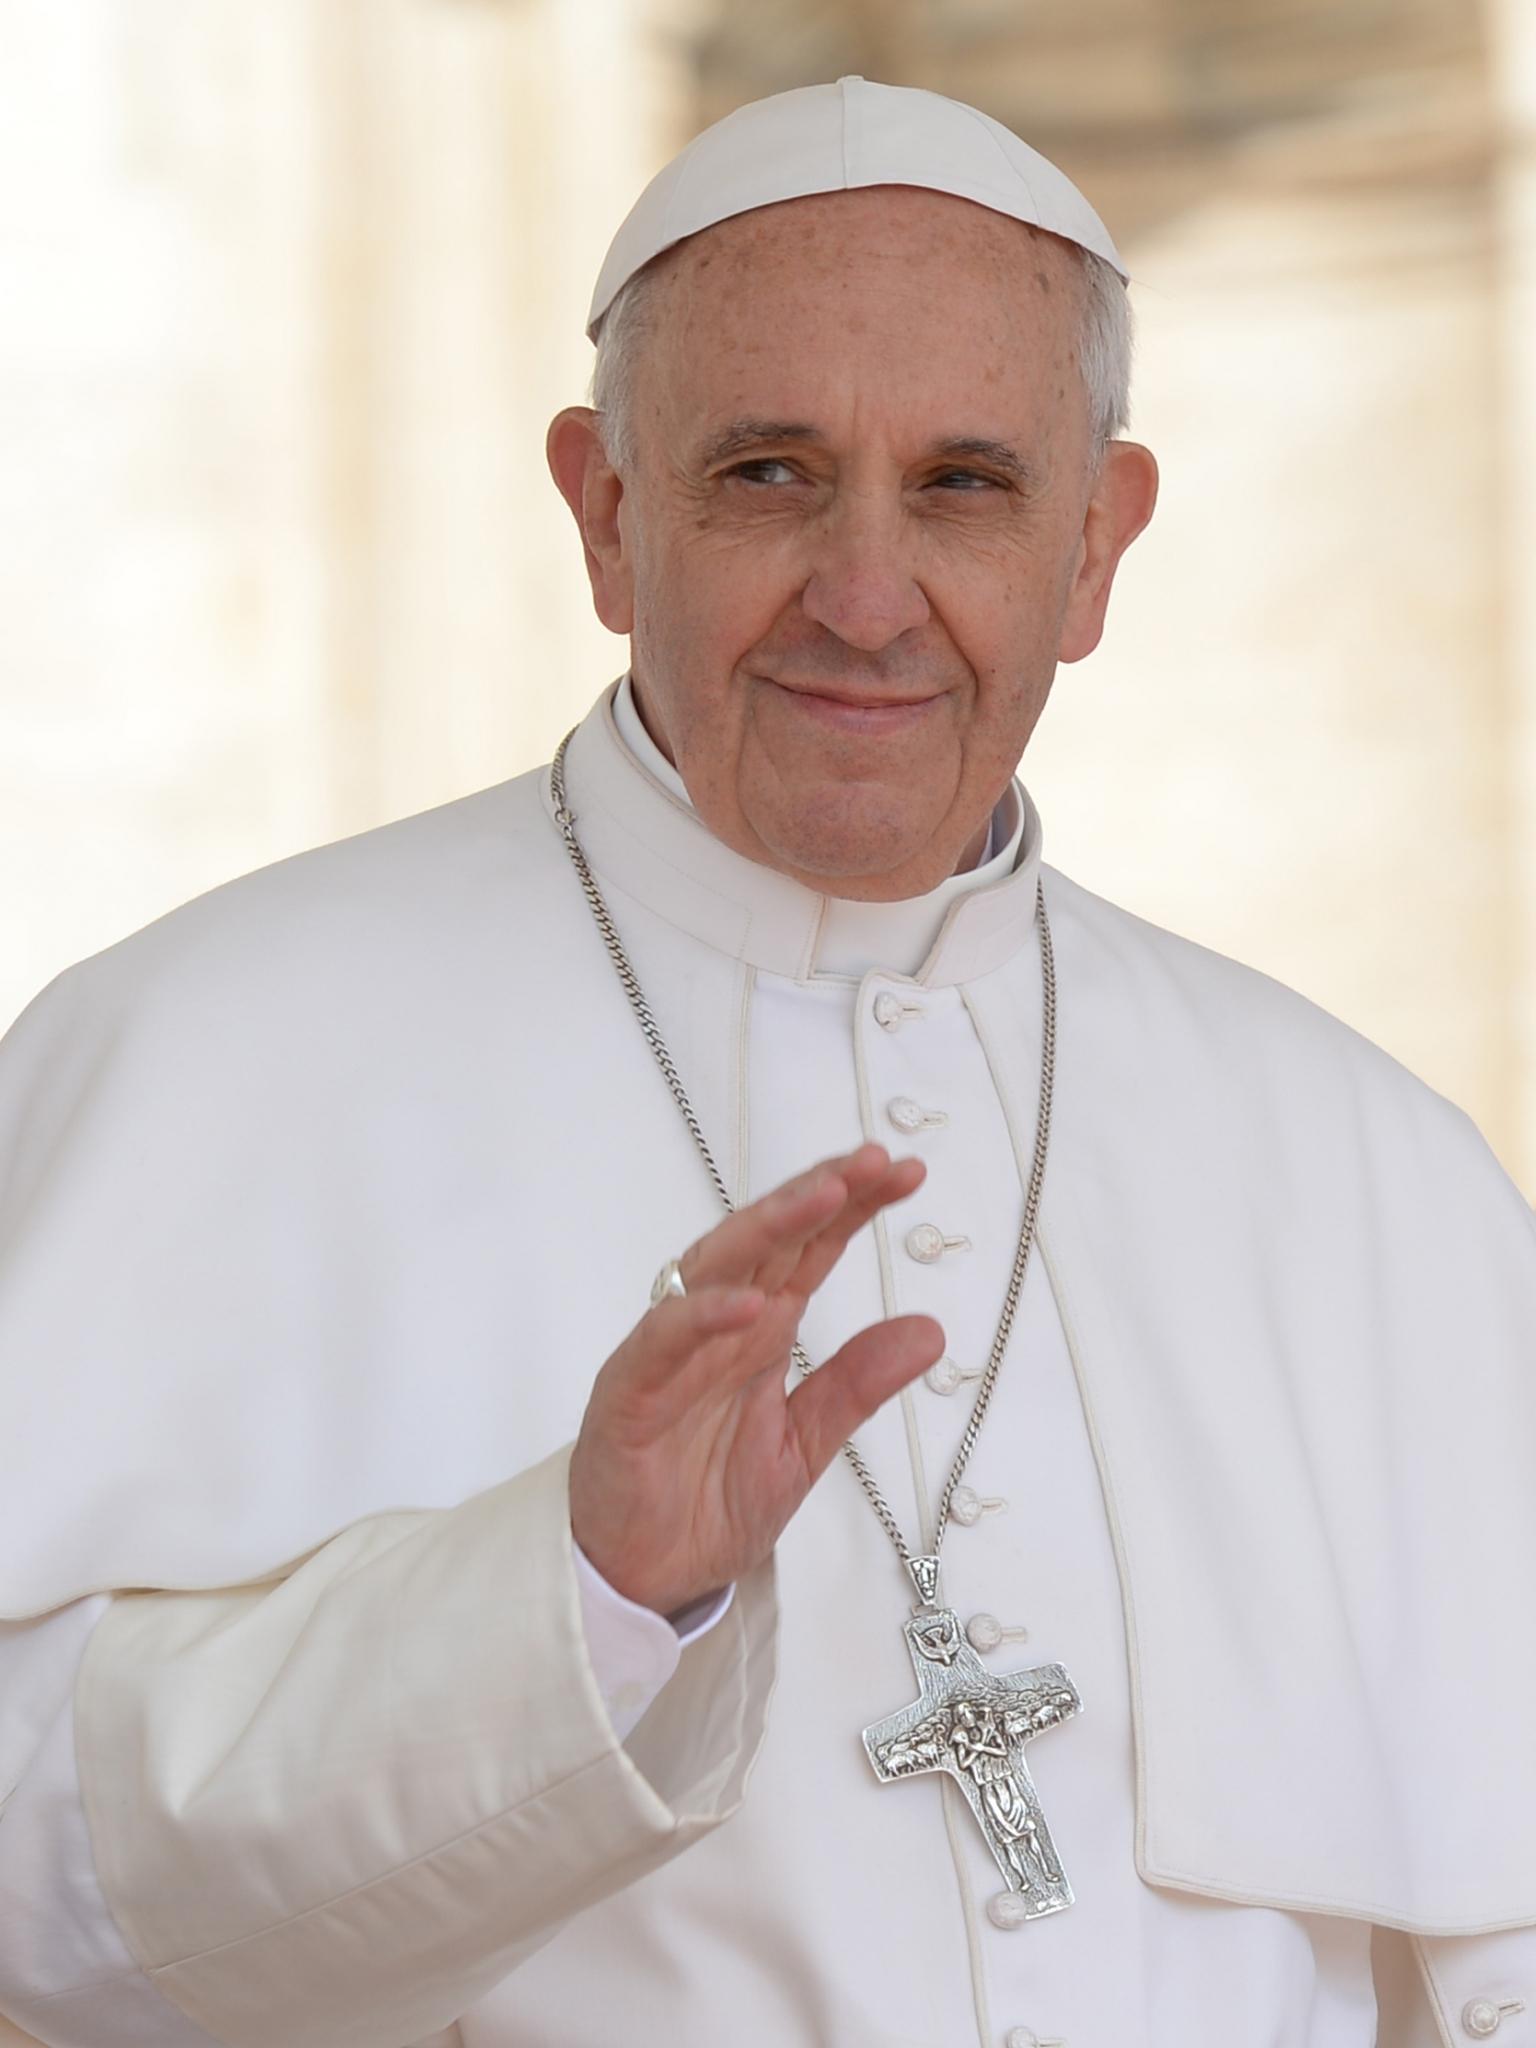 download Pope Francis God Lights [2362x2225] for your Desktop 1536x2048